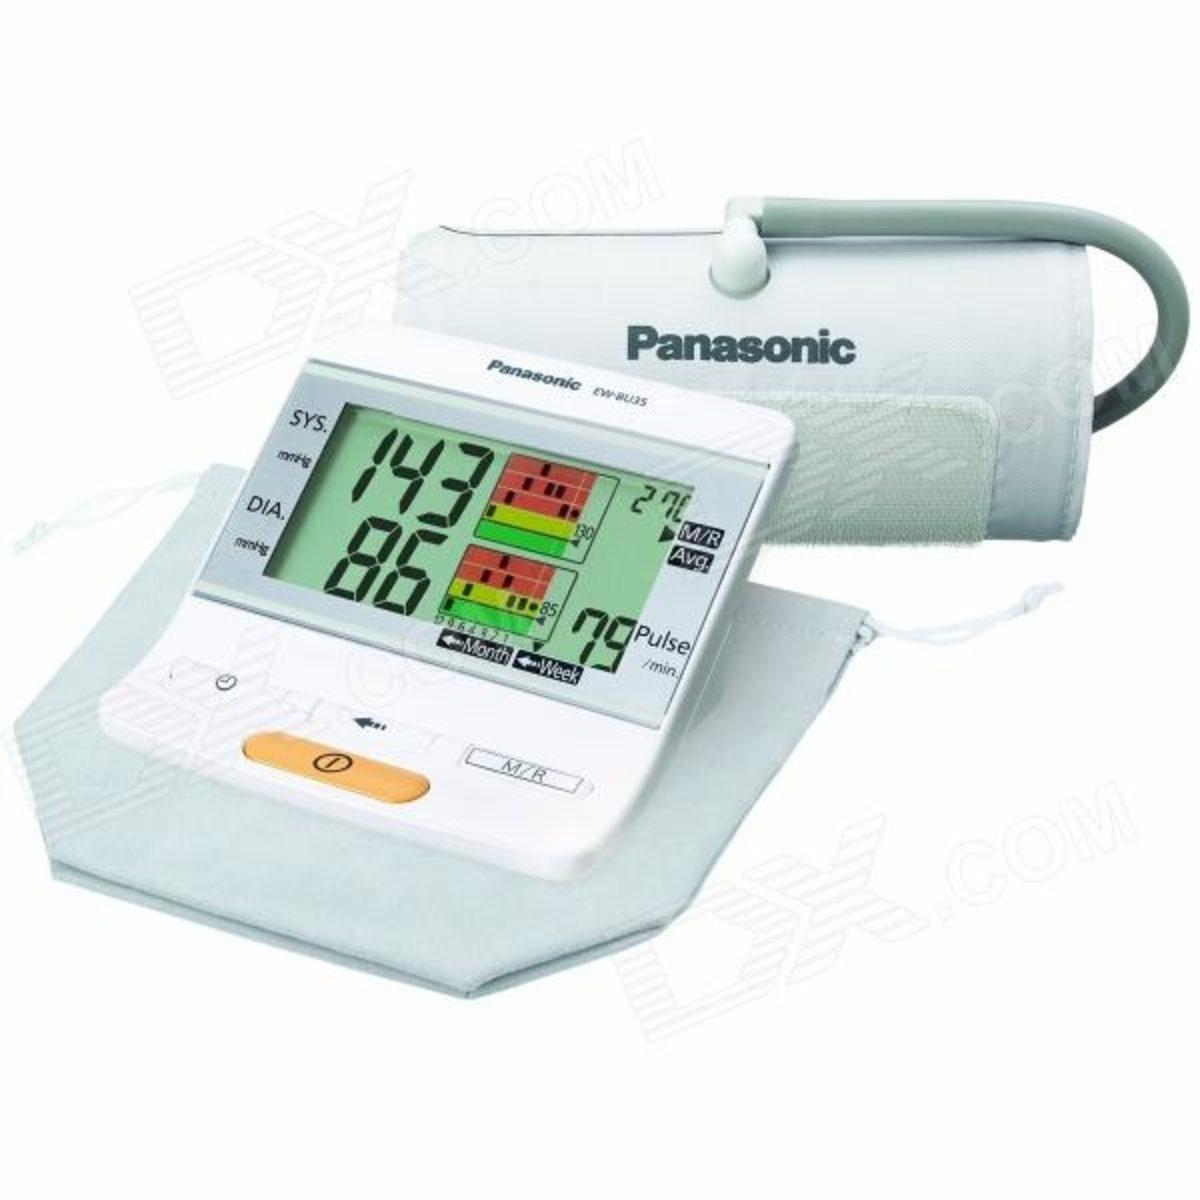 EW-BU35 Upper Arm Blood Pressure Monitor (Authorized Imported)